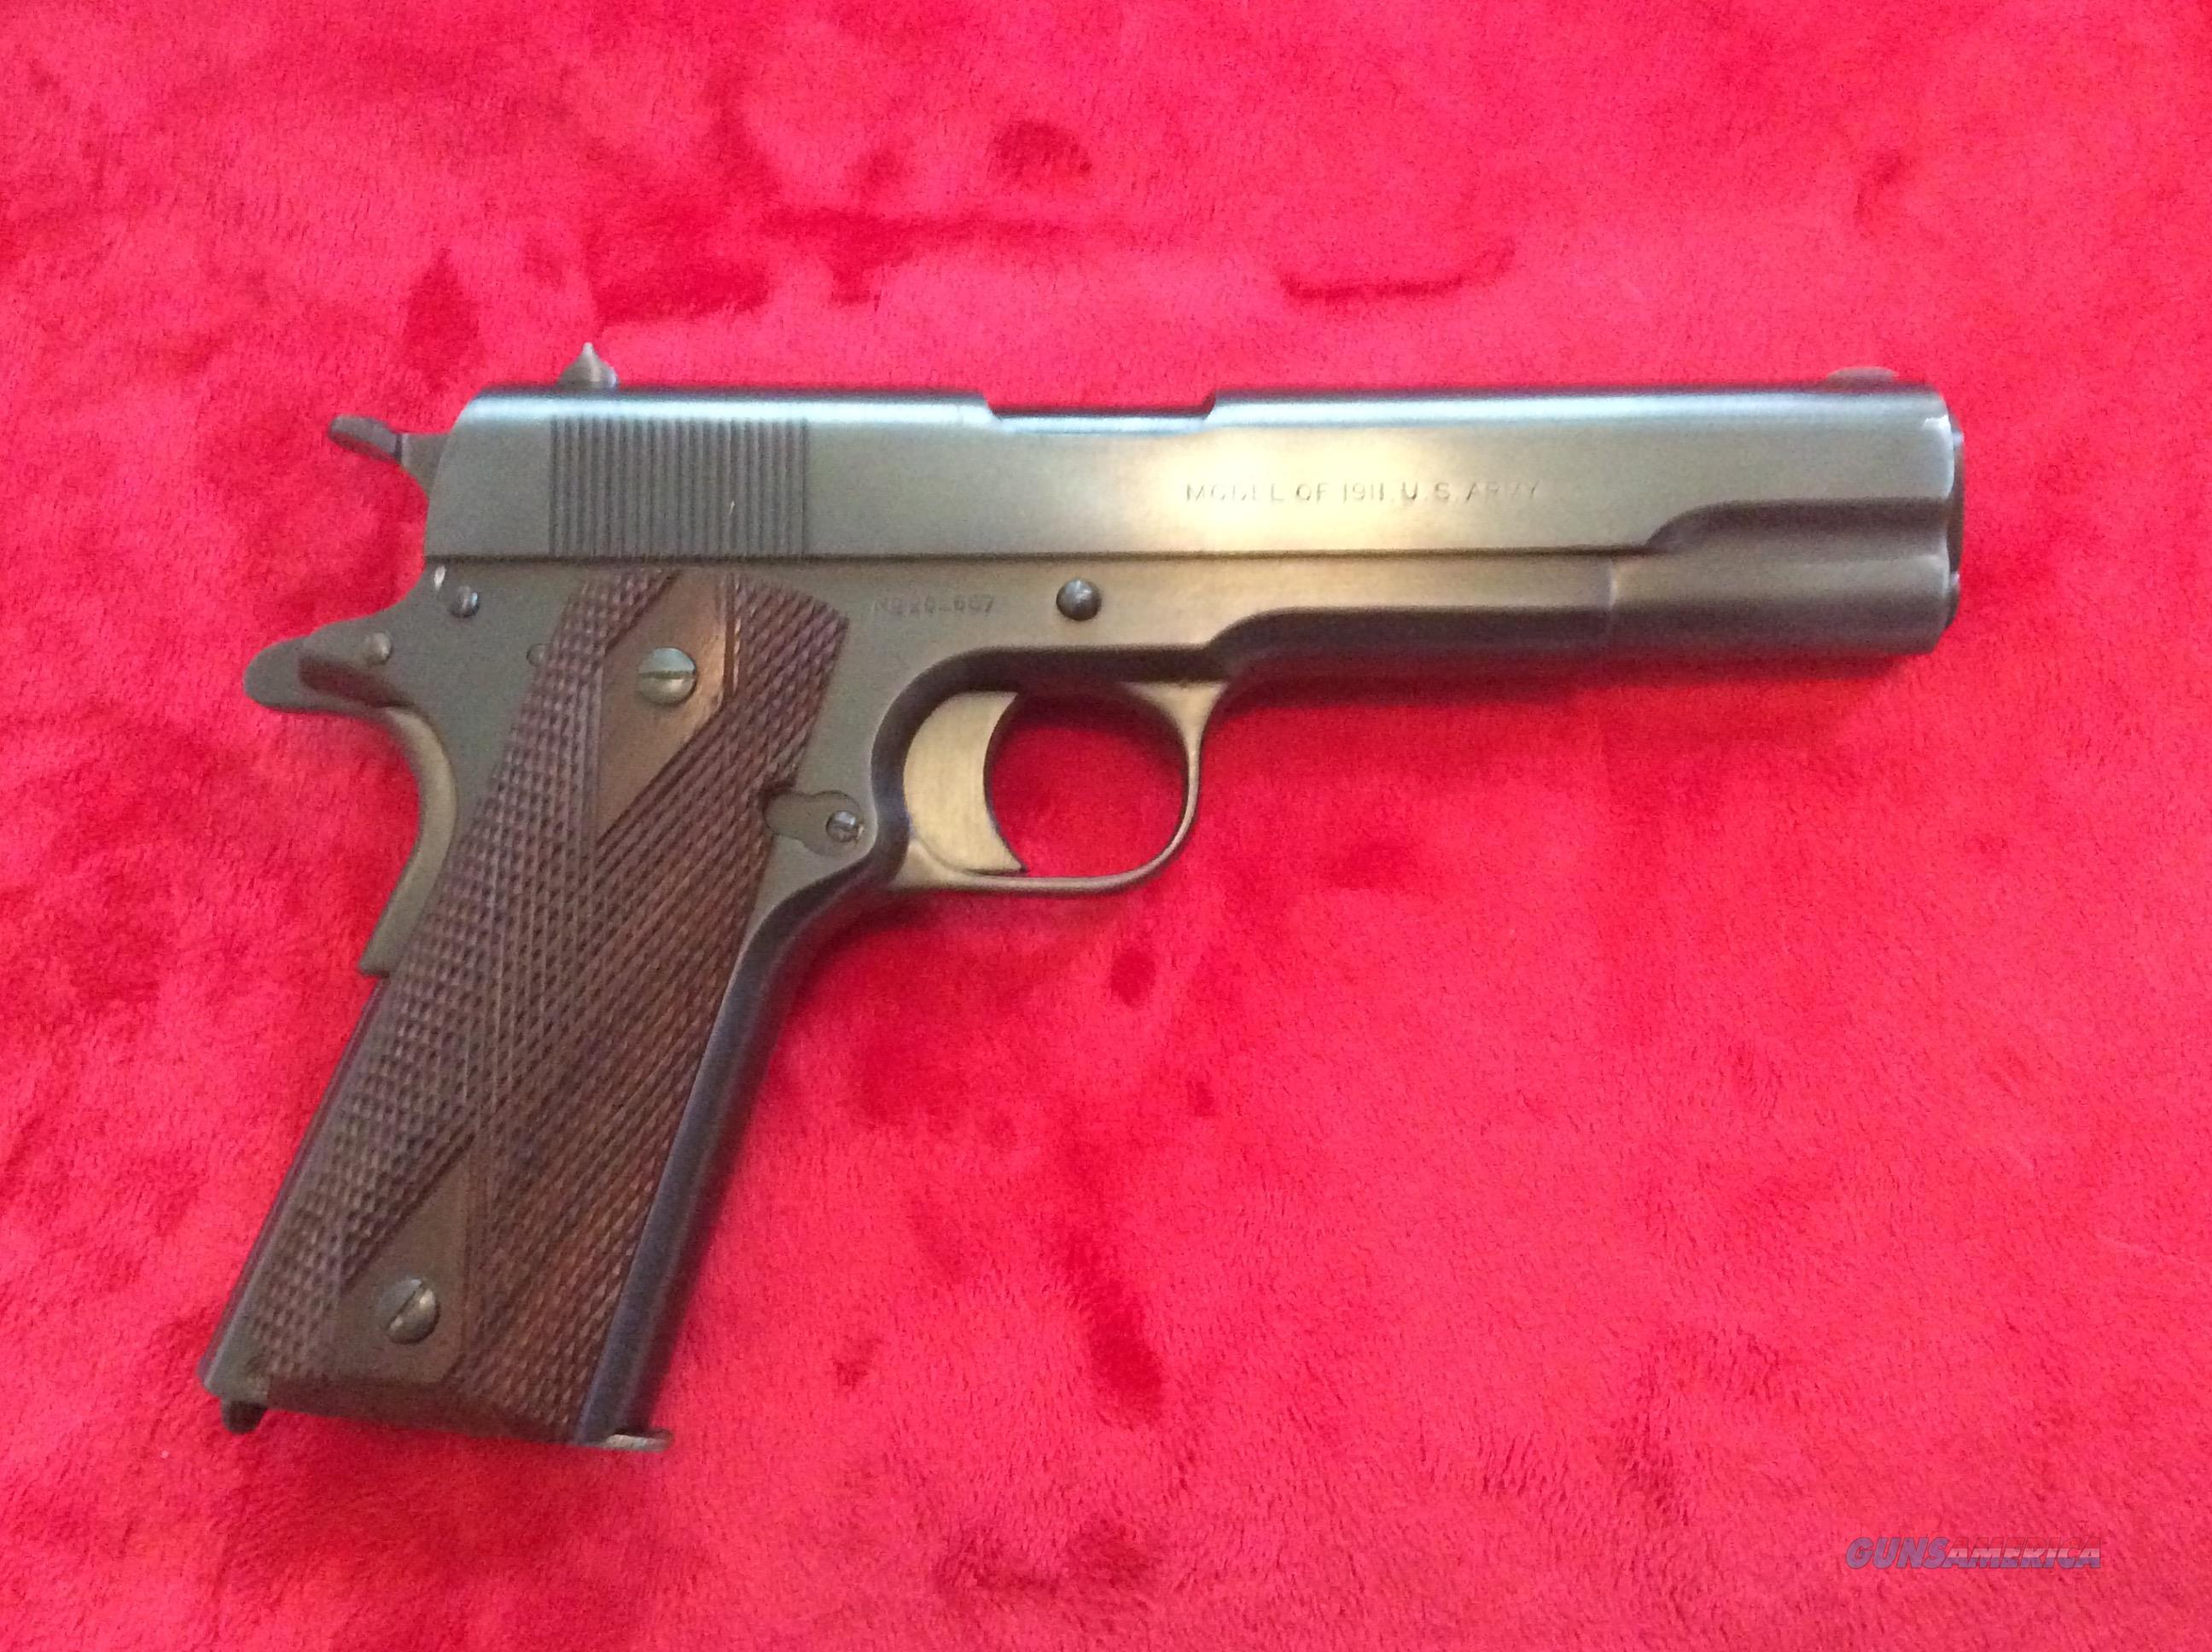 Colt model 1911 U.S. Army .45acp  Guns > Pistols > Colt Automatic Pistols (1911 & Var)